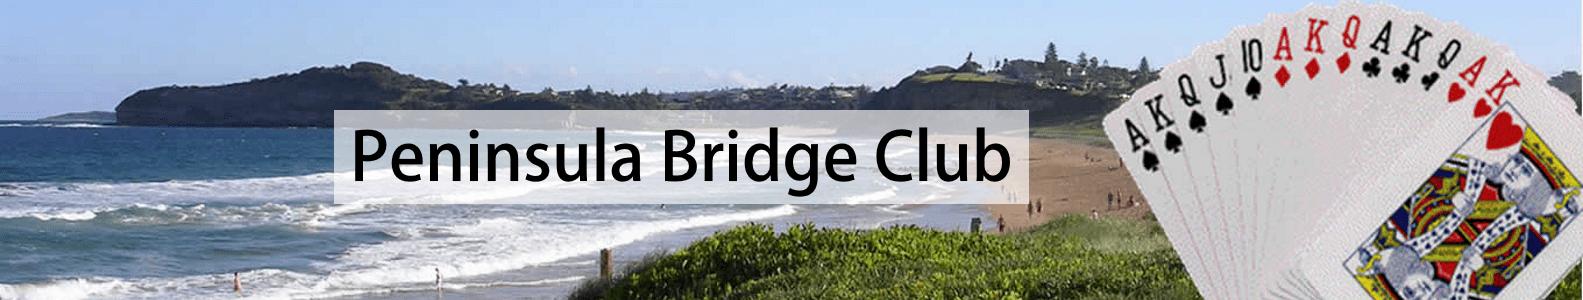 Peninsula Bridge Club Online Swiss Teams Congress Information Page